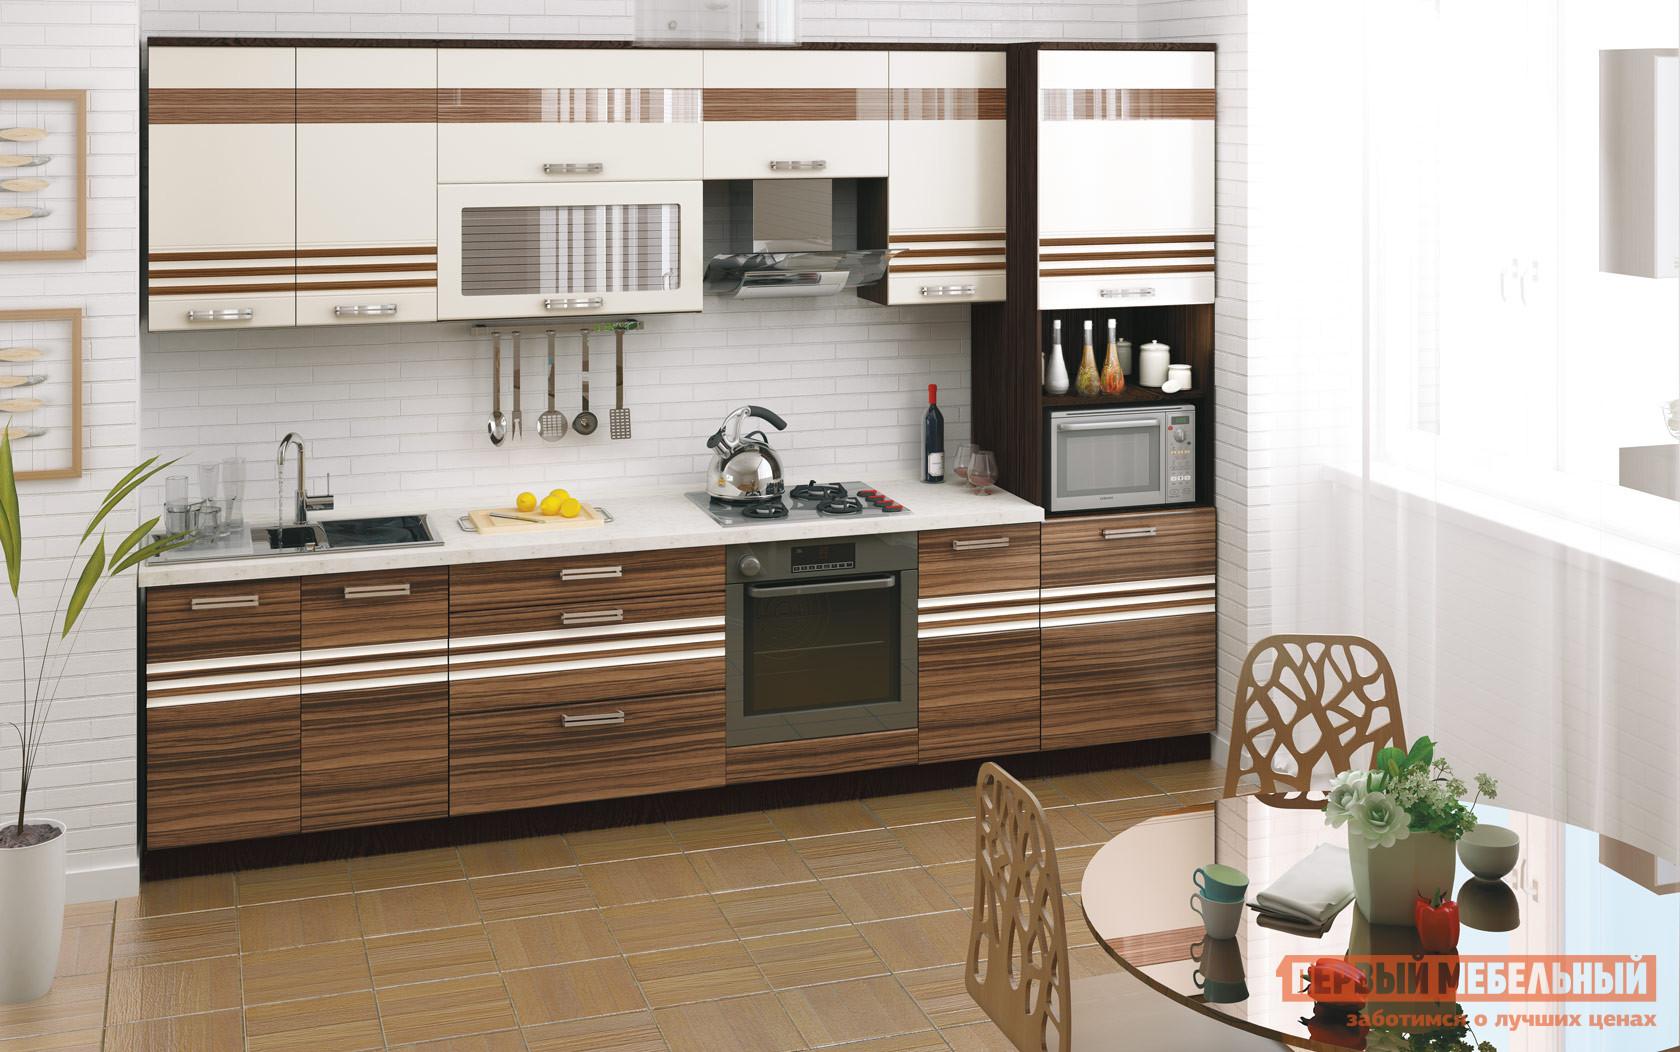 Кухонный гарнитур Витра Рио 320 кухонный гарнитур витра глория 3 к2